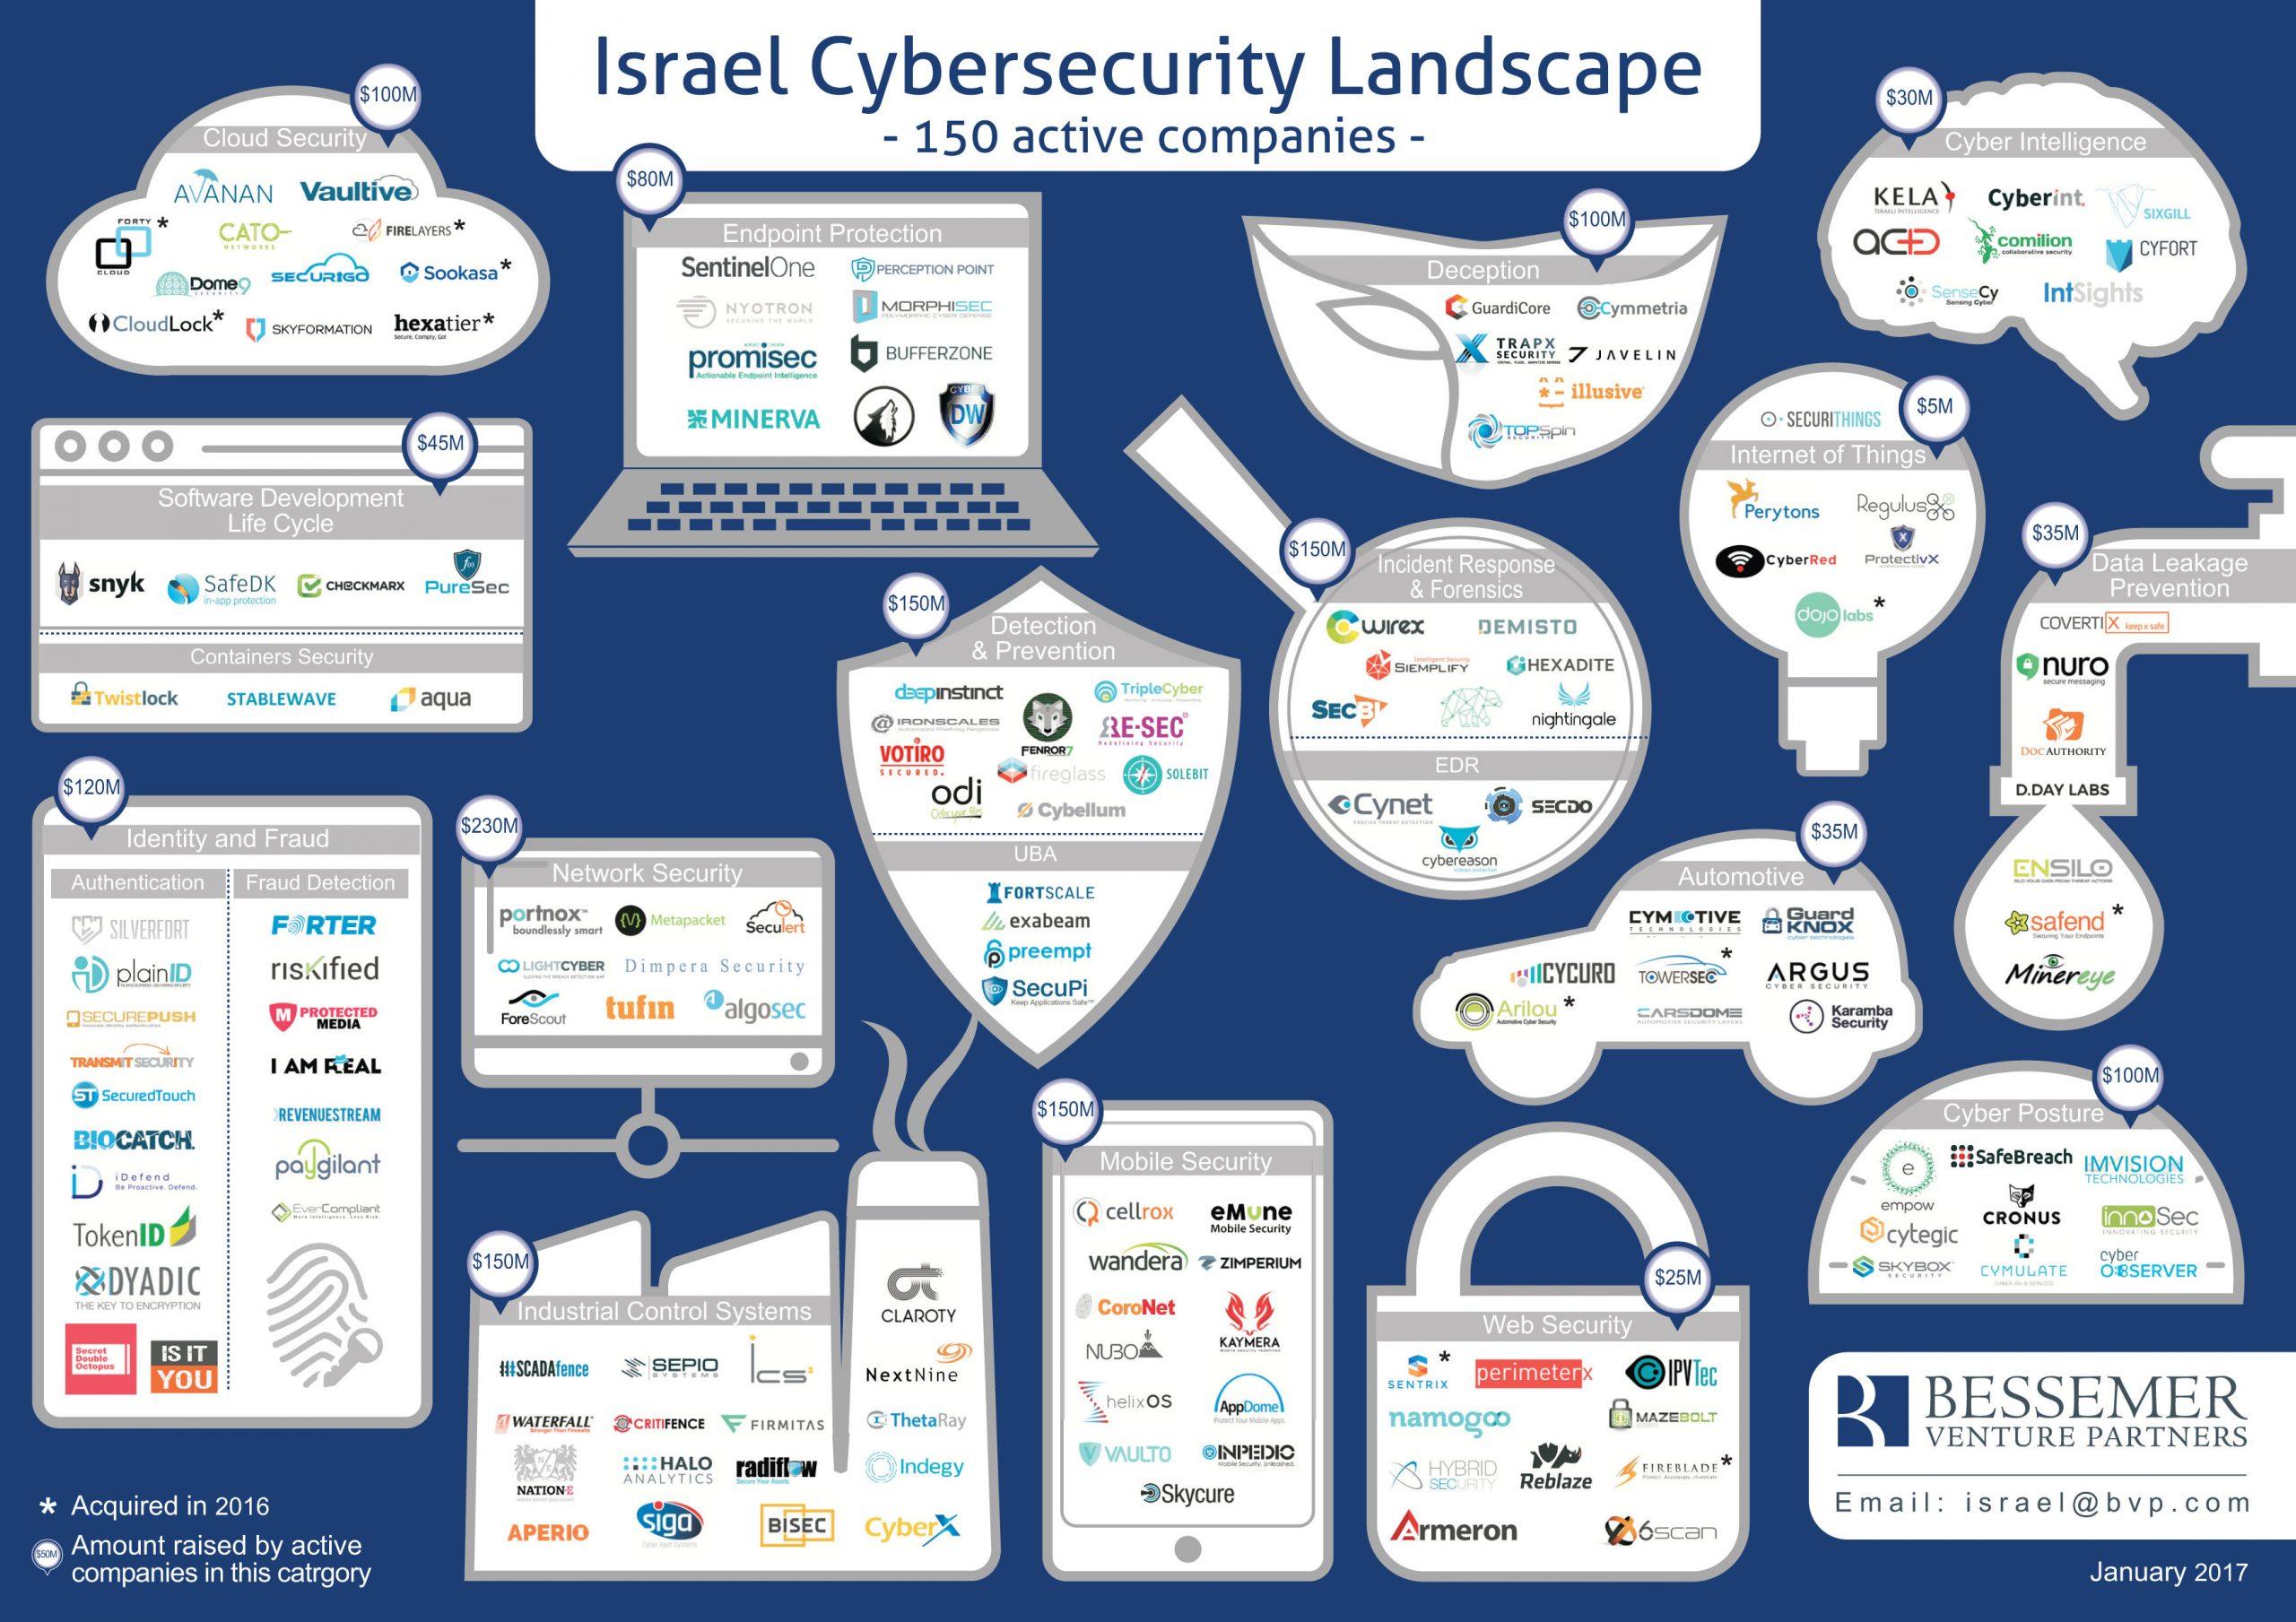 Panorama Israeliano in cybersecurity